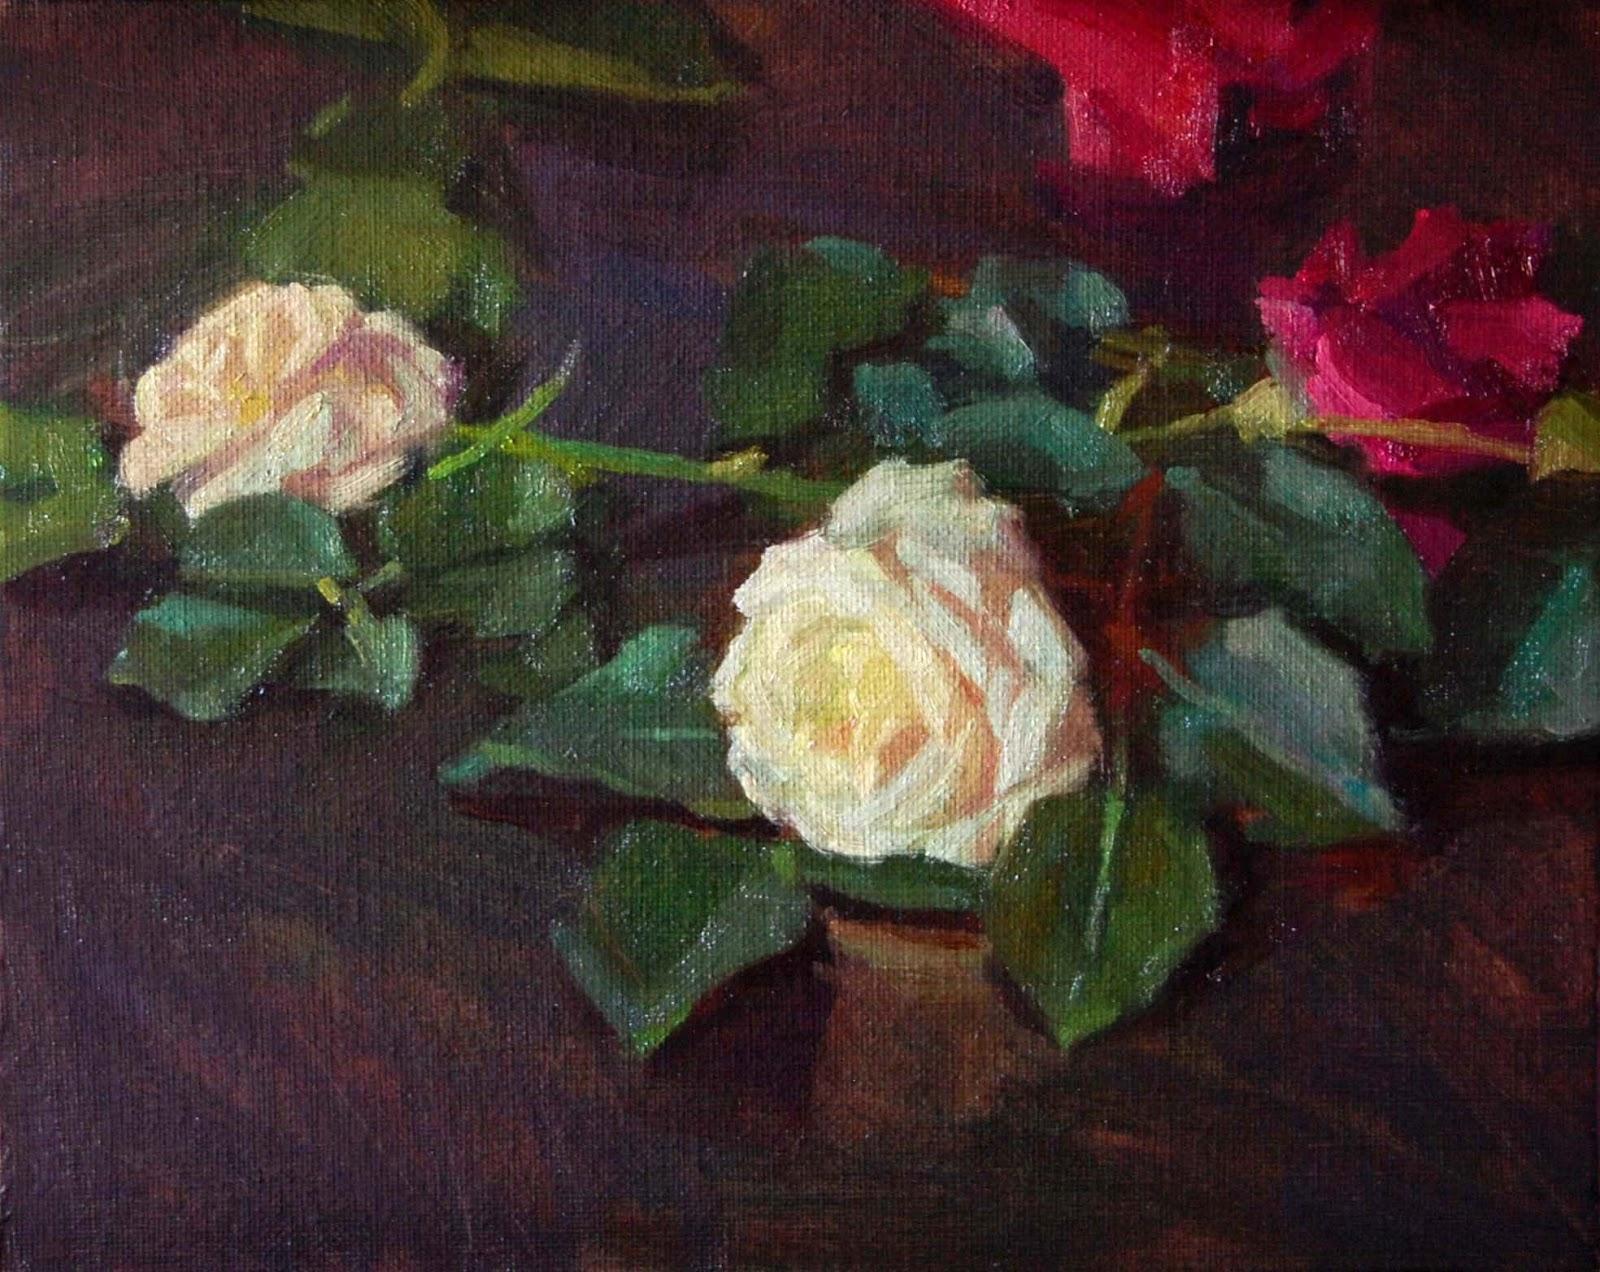 Kerry Dunn Studio 2 Small Rose Paintings Alla Prima